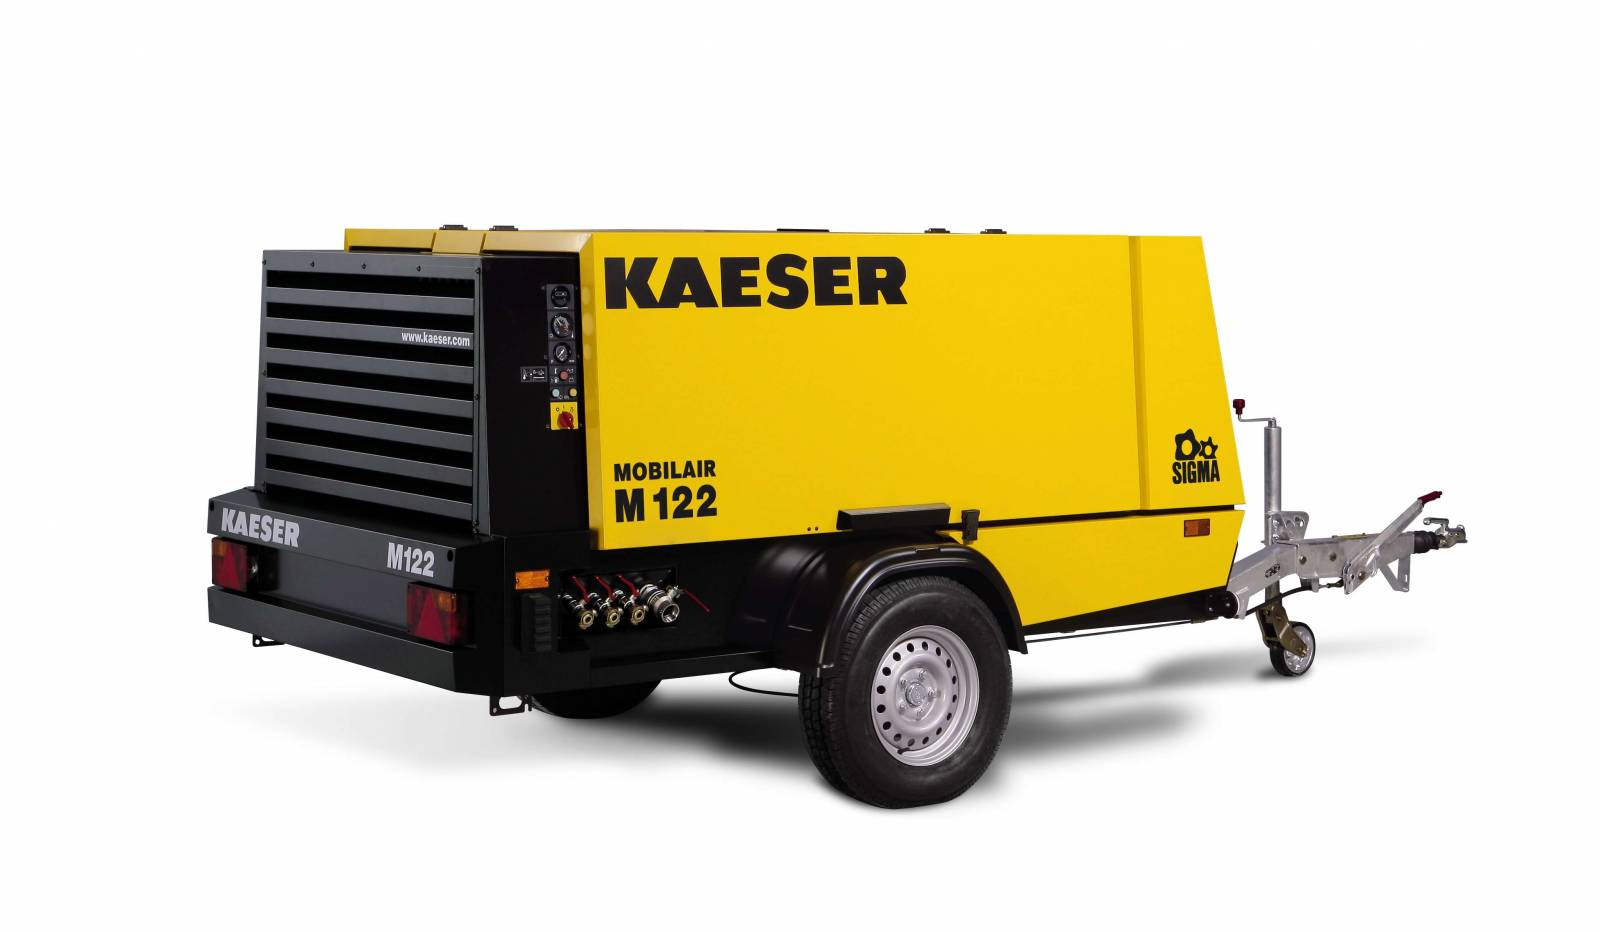 Kompressor KAESER M122